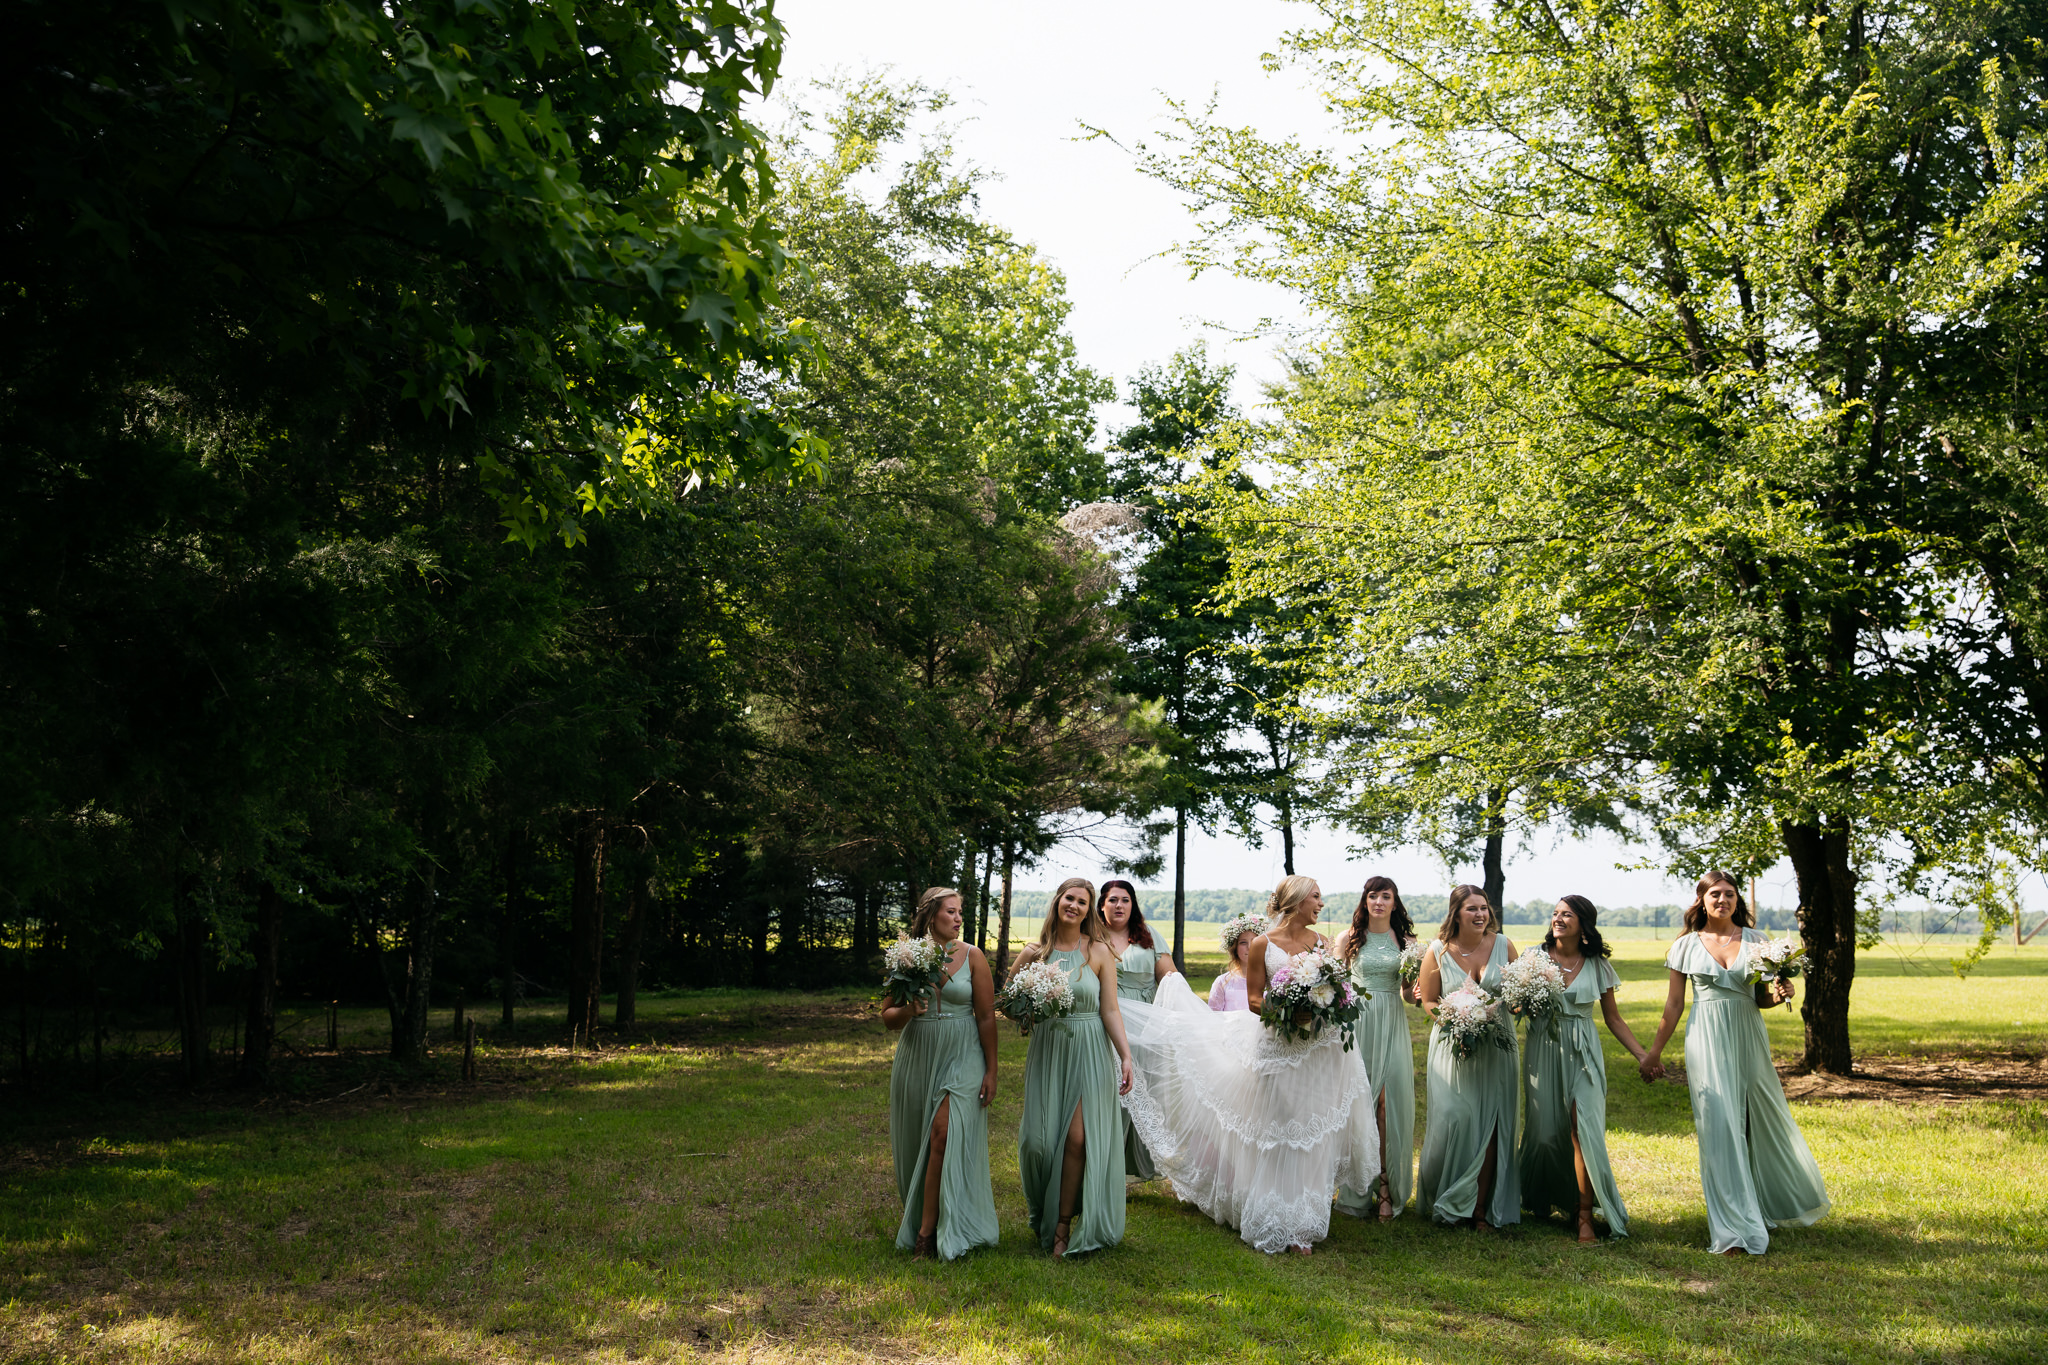 backyard-wedding-thewarmtharoundyou-lexy-branson-39.jpg